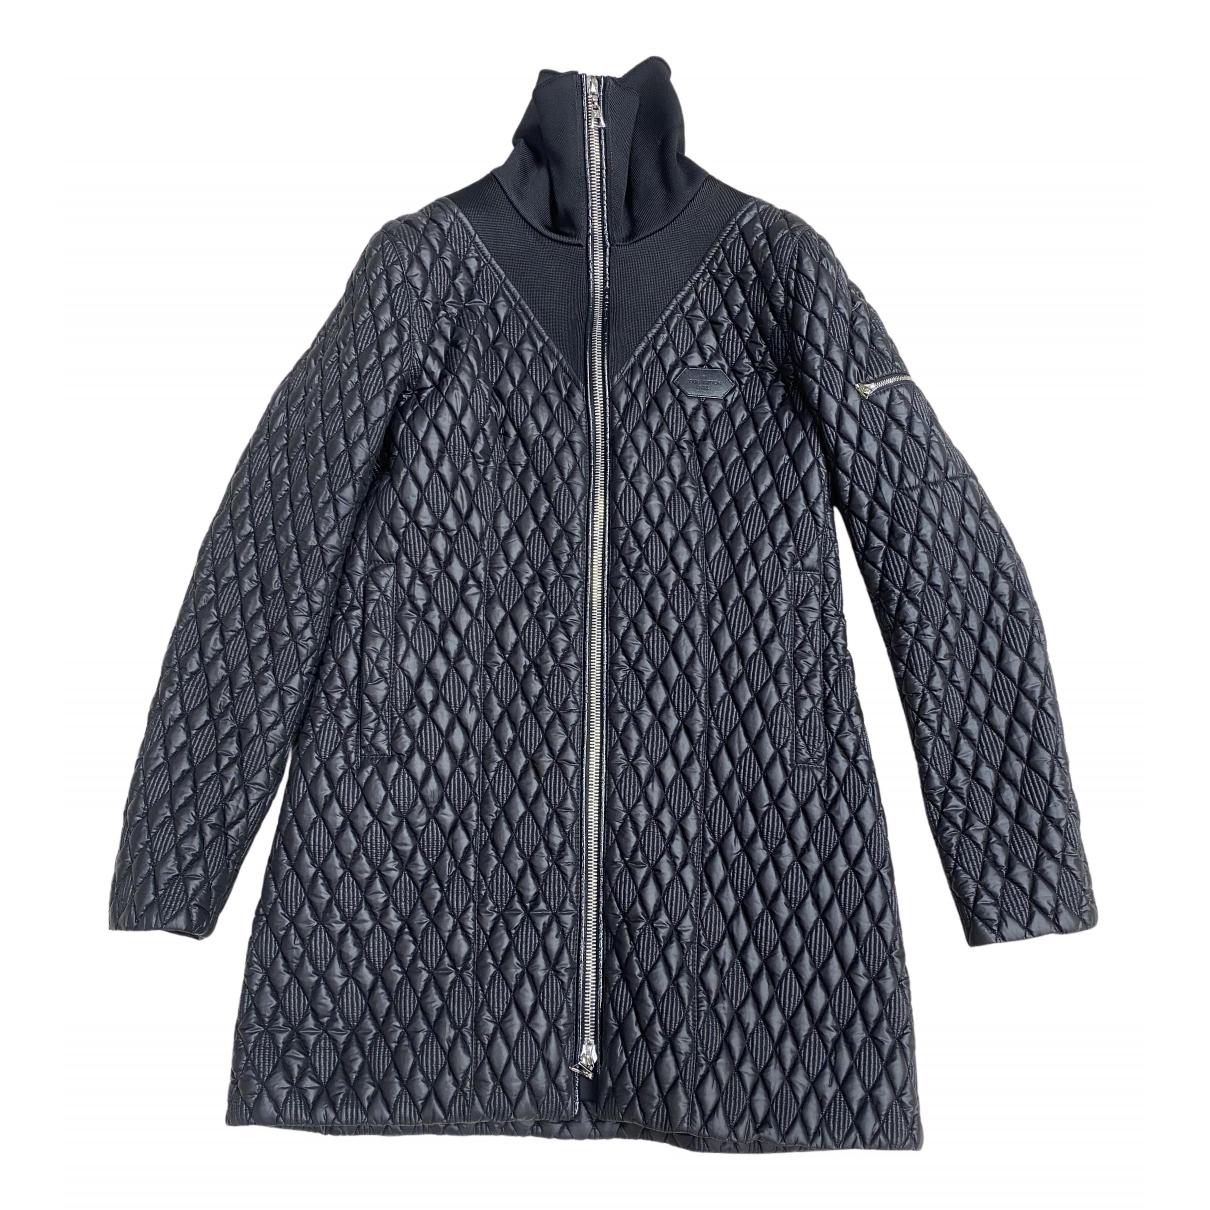 Louis Vuitton N Black jacket for Women 40 FR